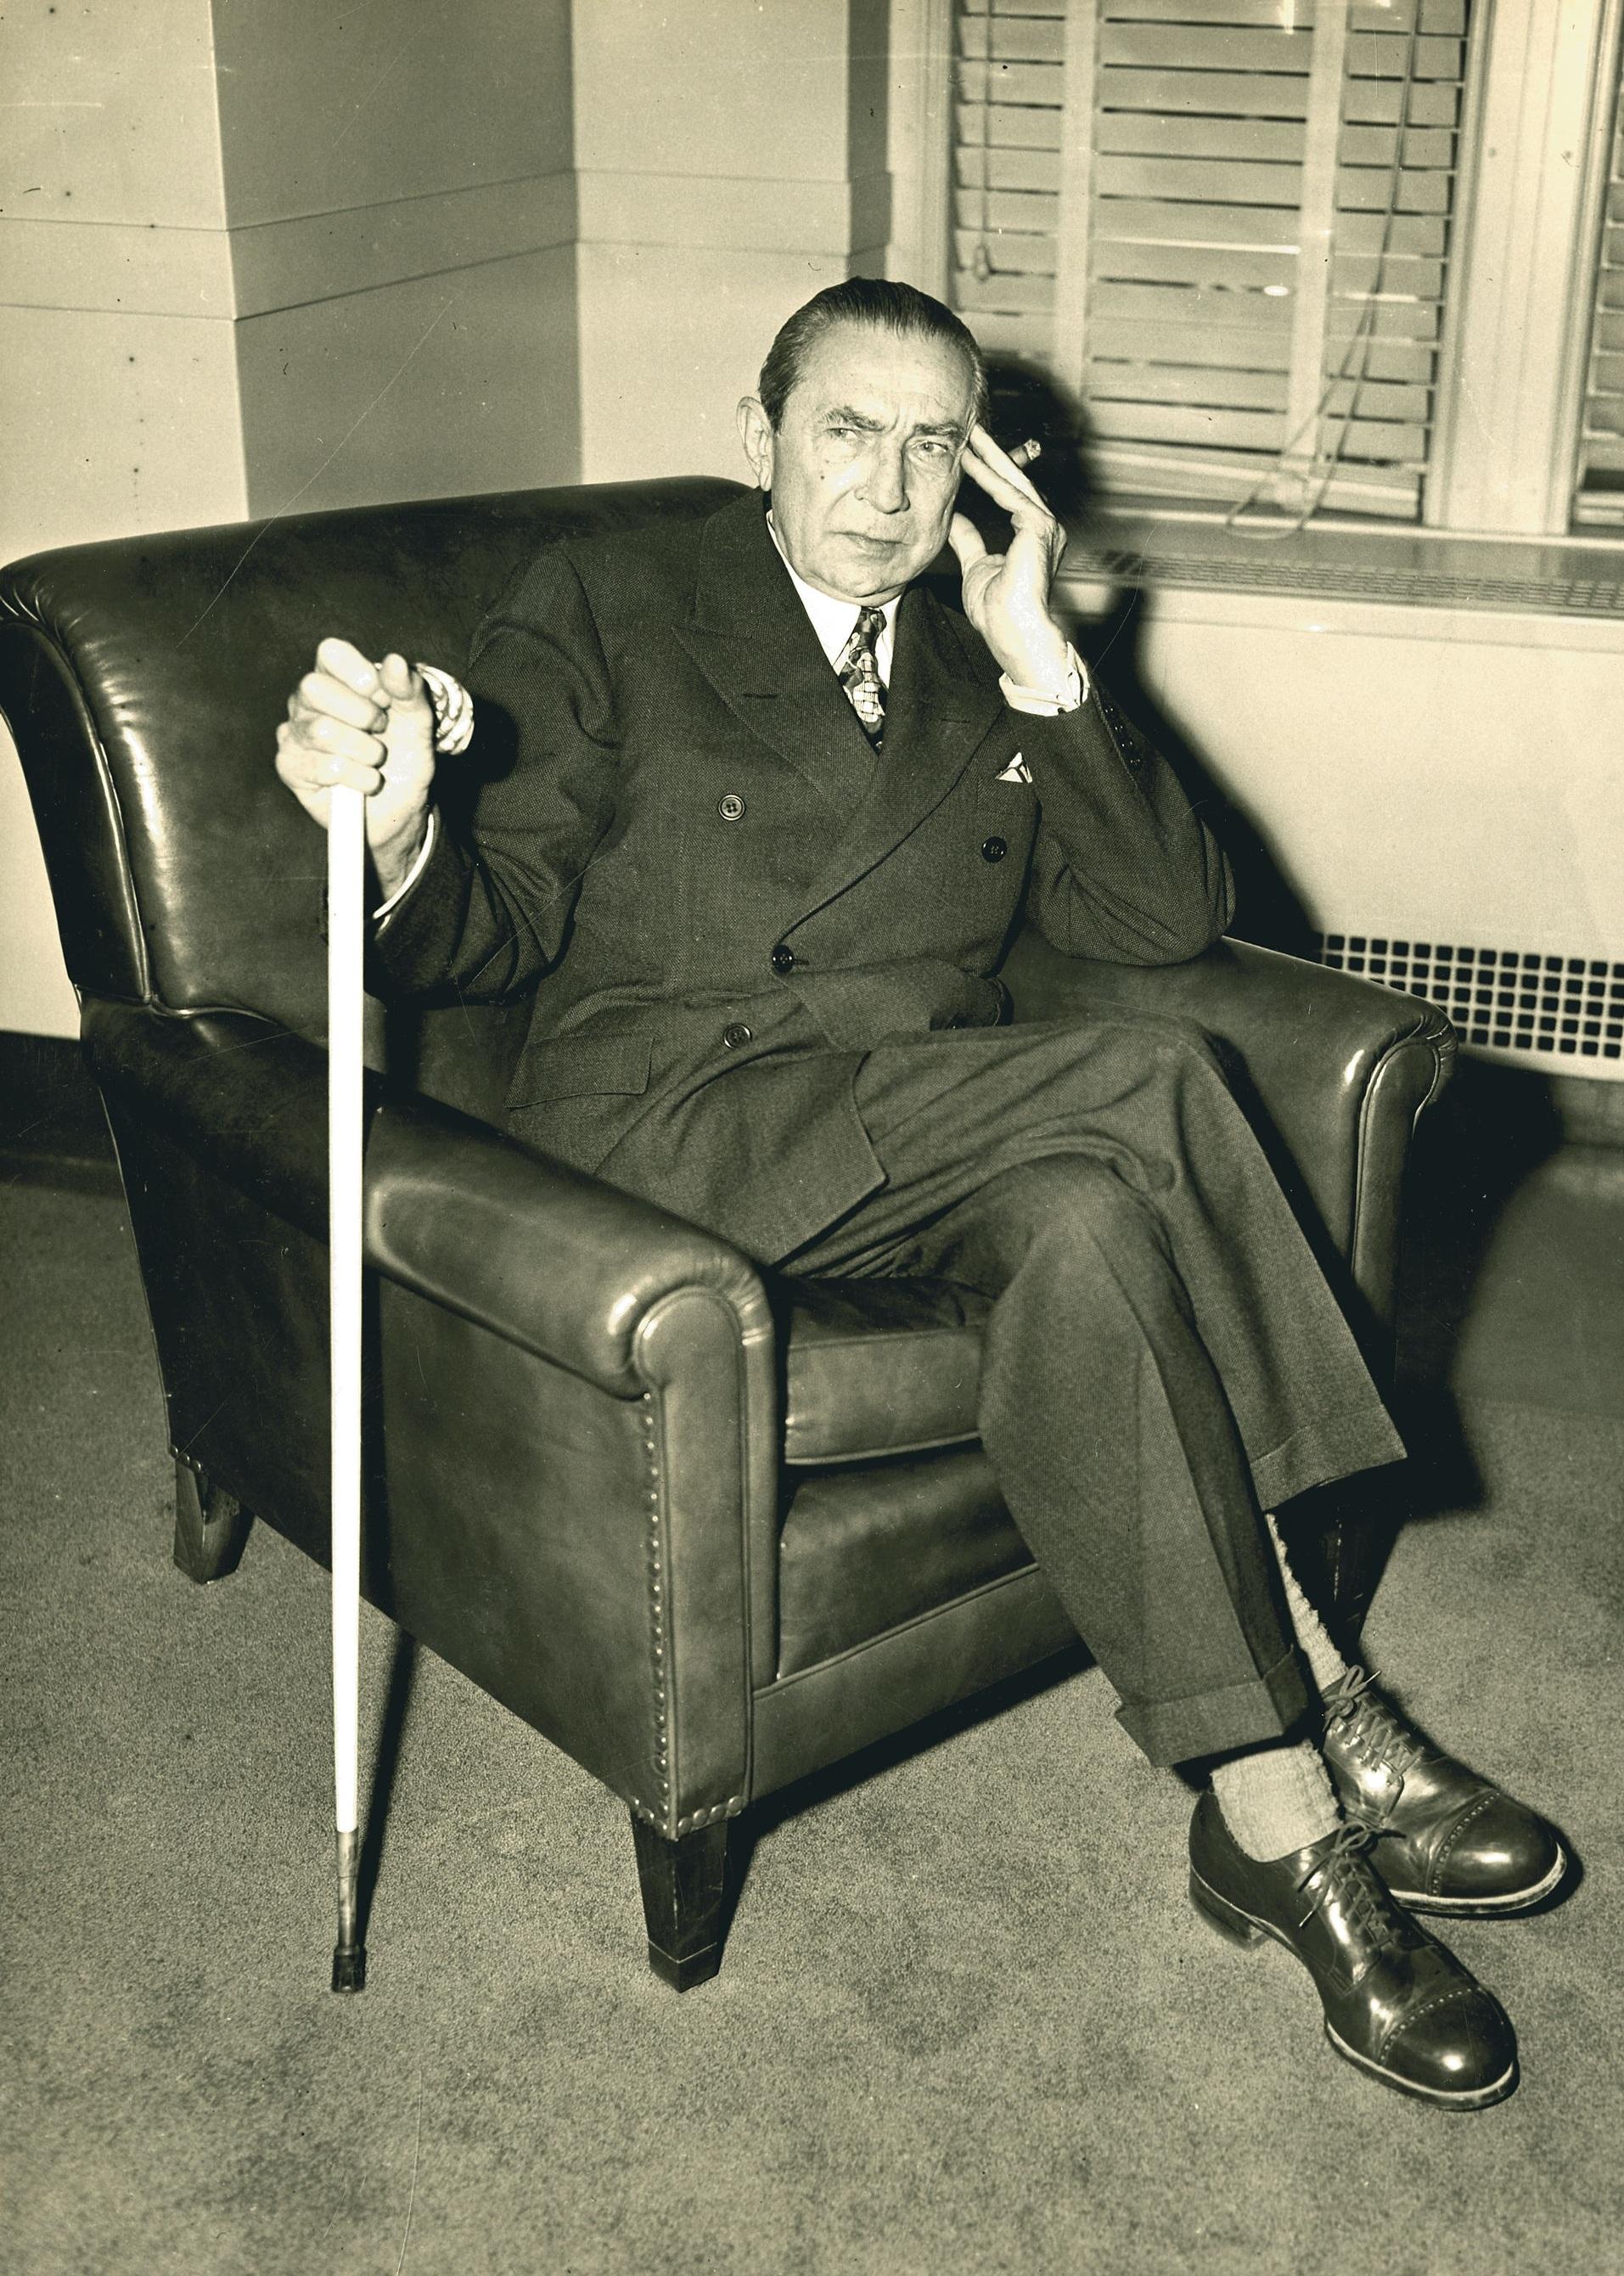 Bela prepares to testify with new cane.